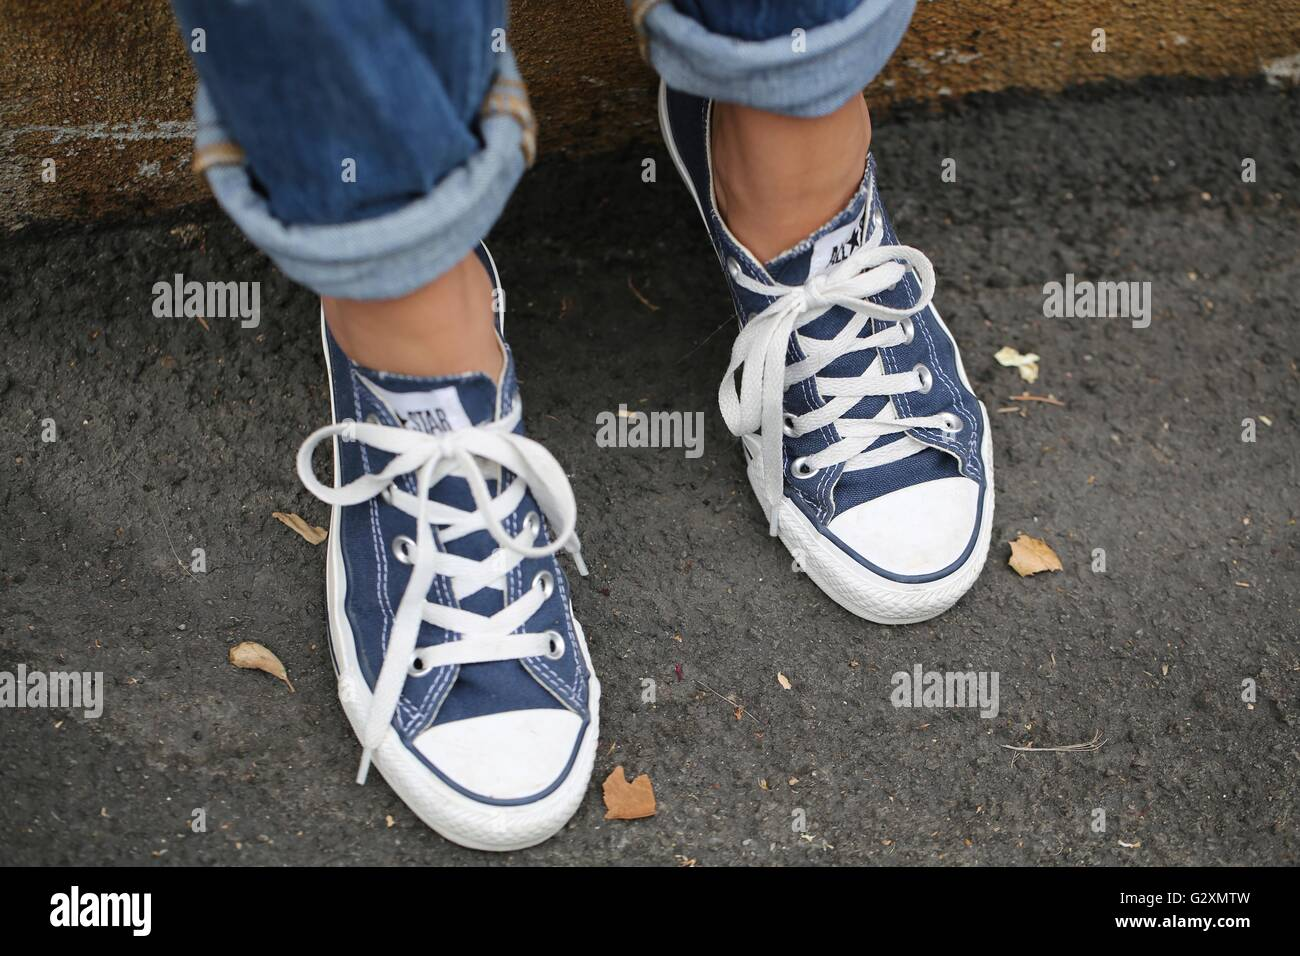 Jeans Tennis Shoes Stock Photos Jeans Tennis Shoes Stock Images